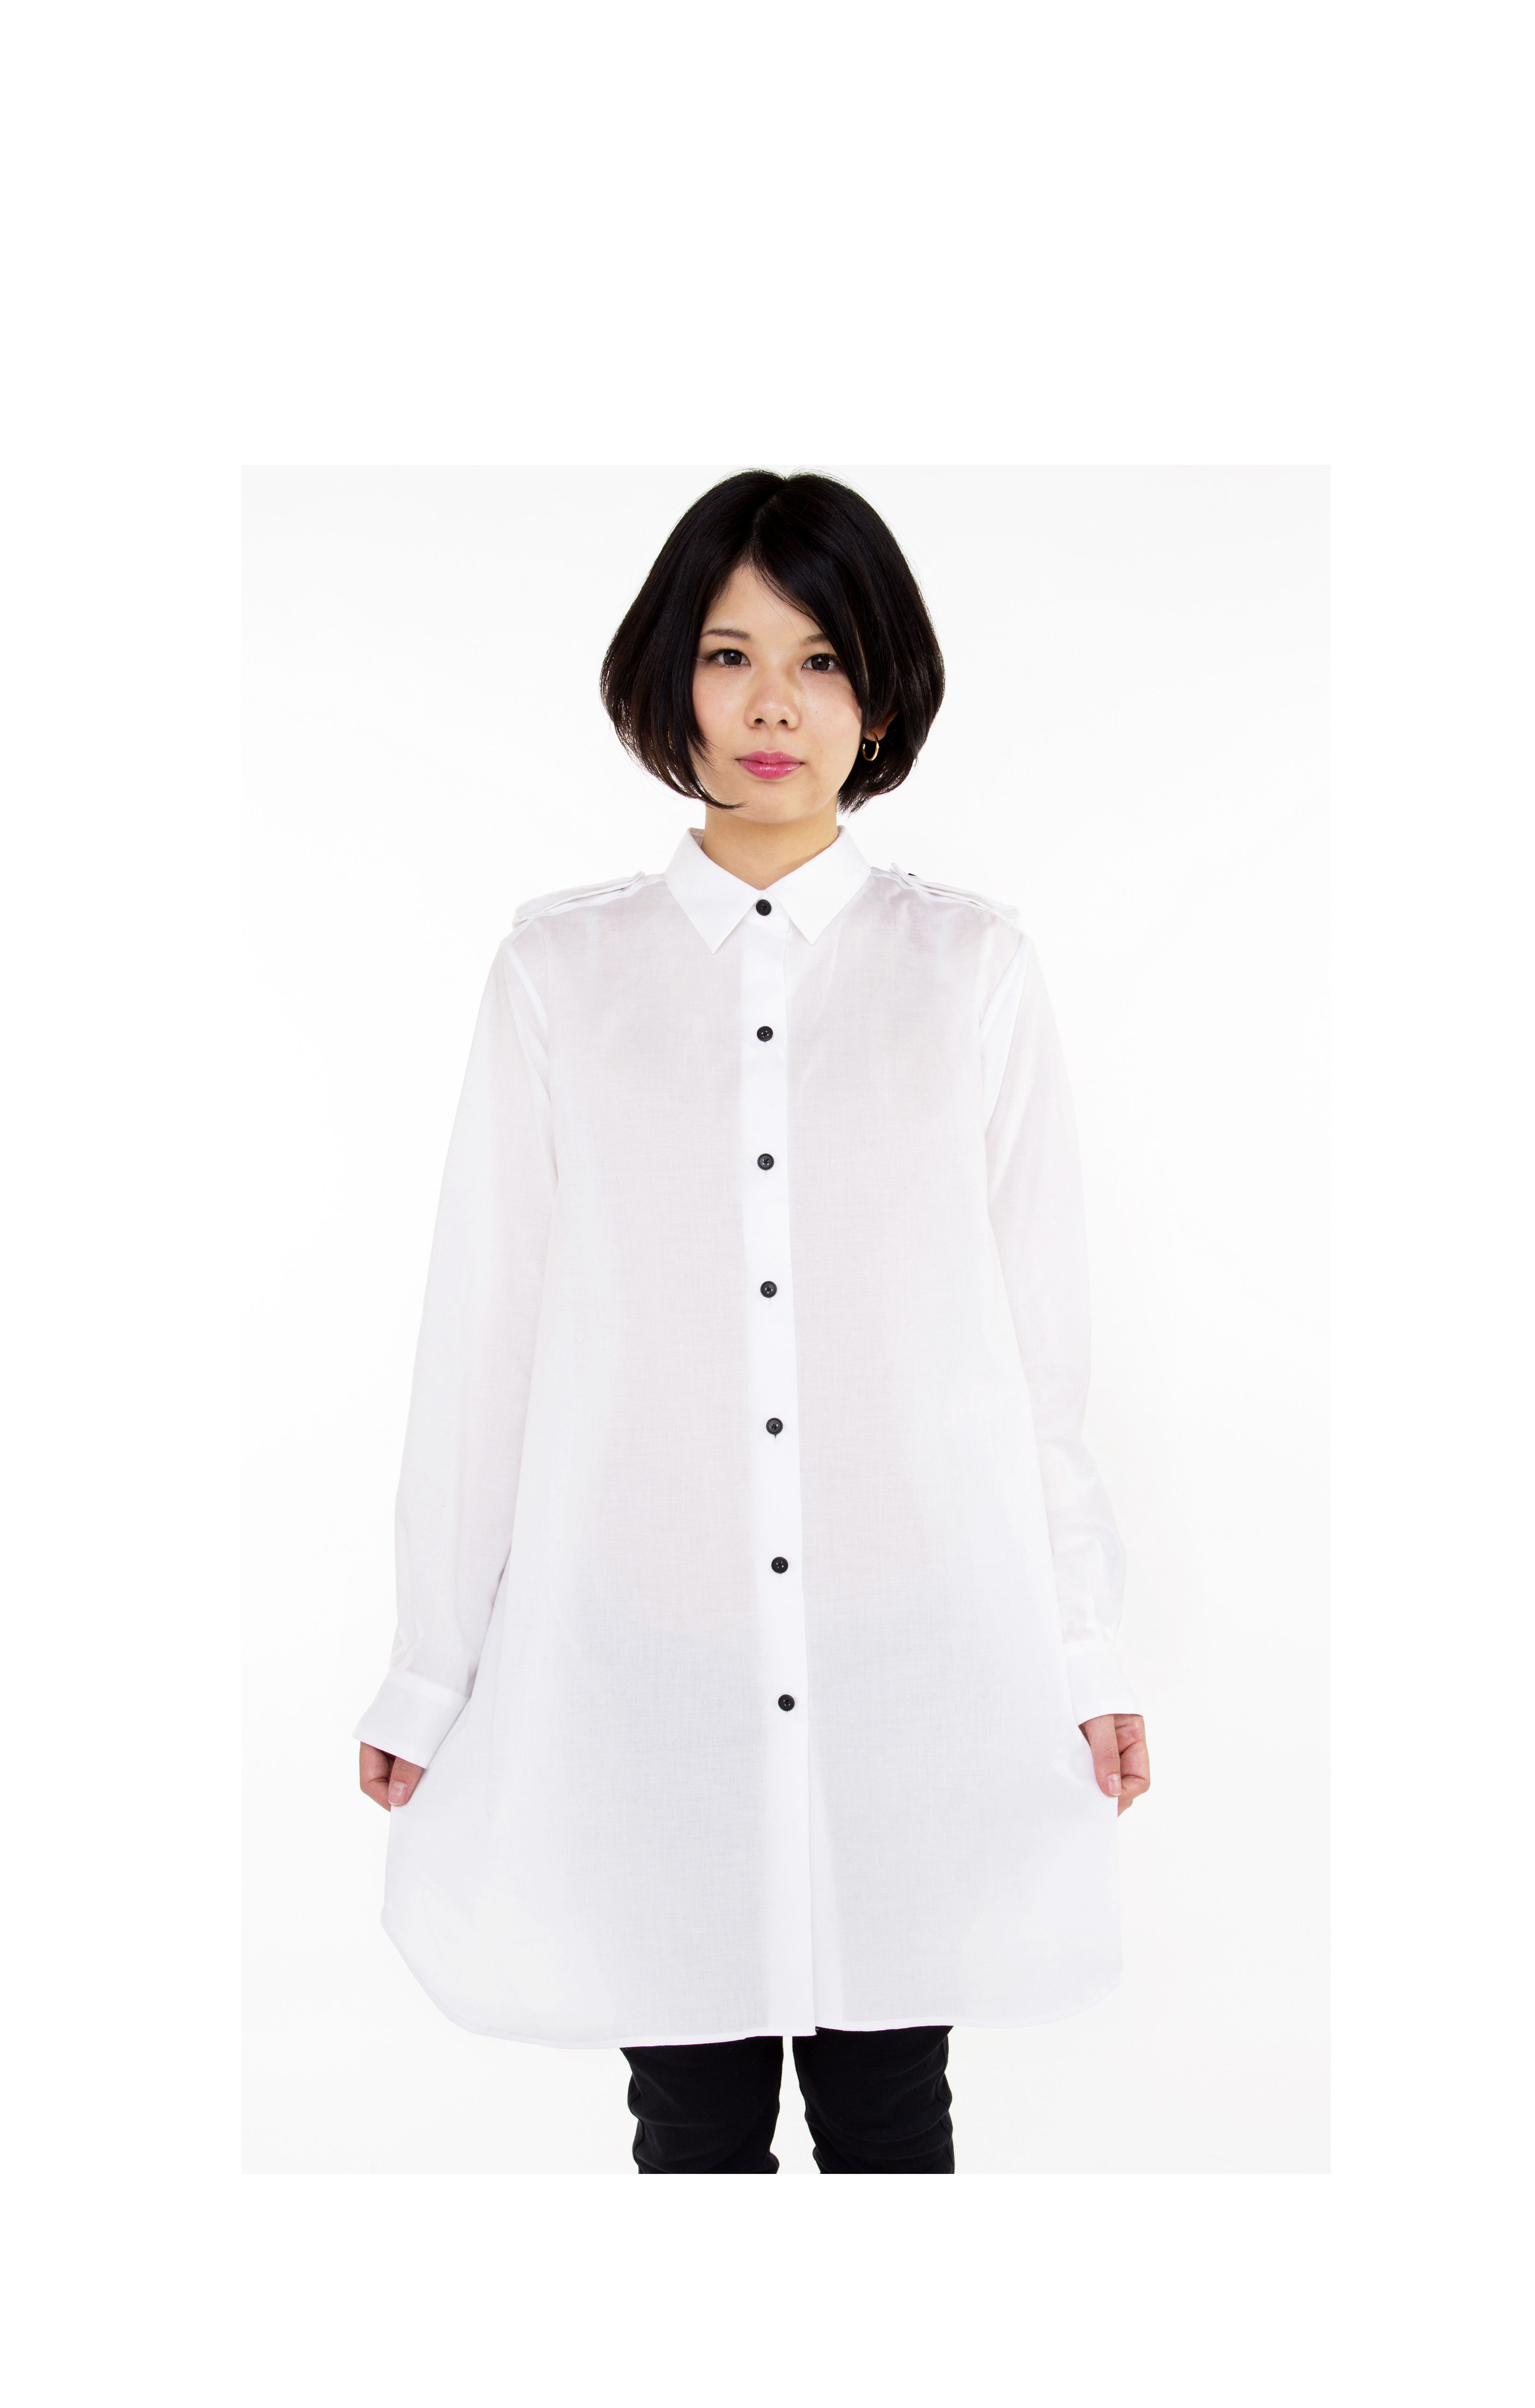 【SALE 50%OFF】 taRo ロングシャツ lady's